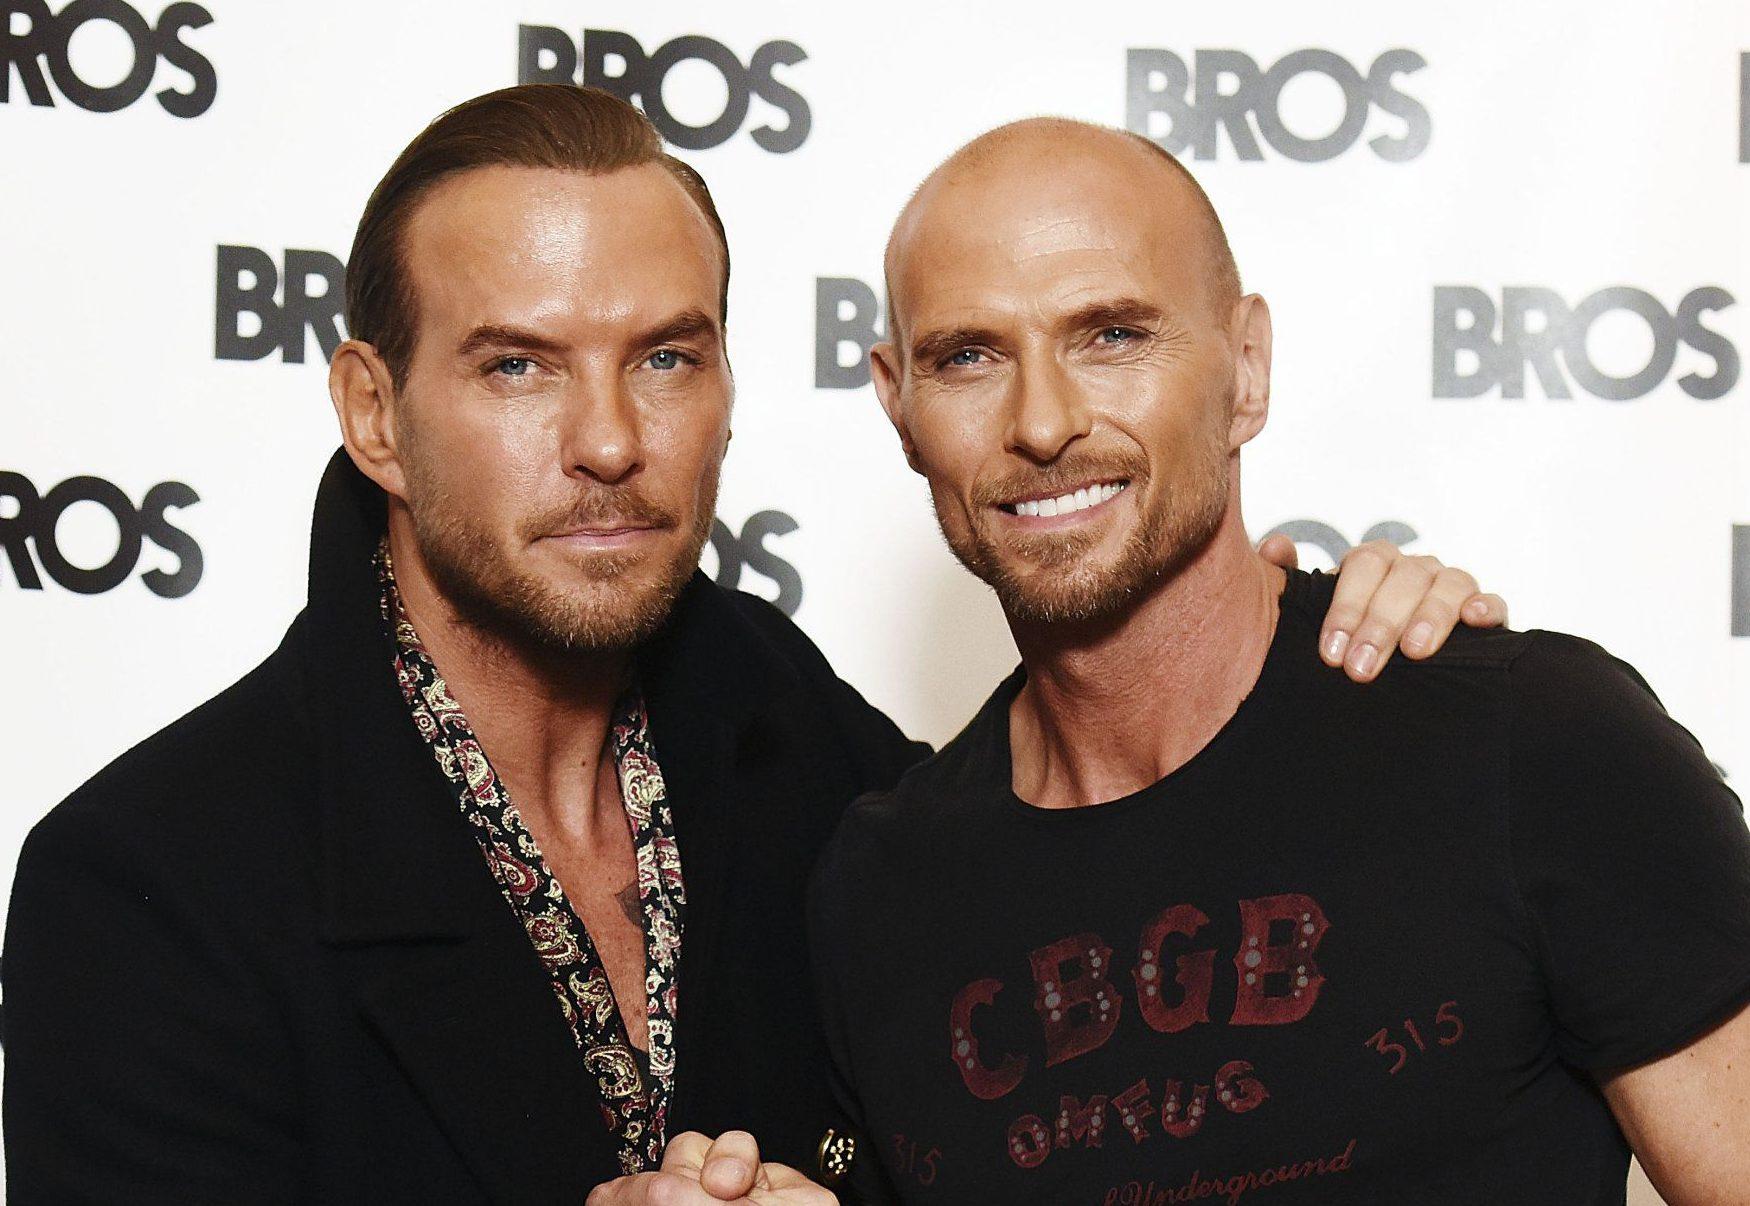 Bros are back! 80s pop stars Matt and Luke Goss reunite 24 years after the band split